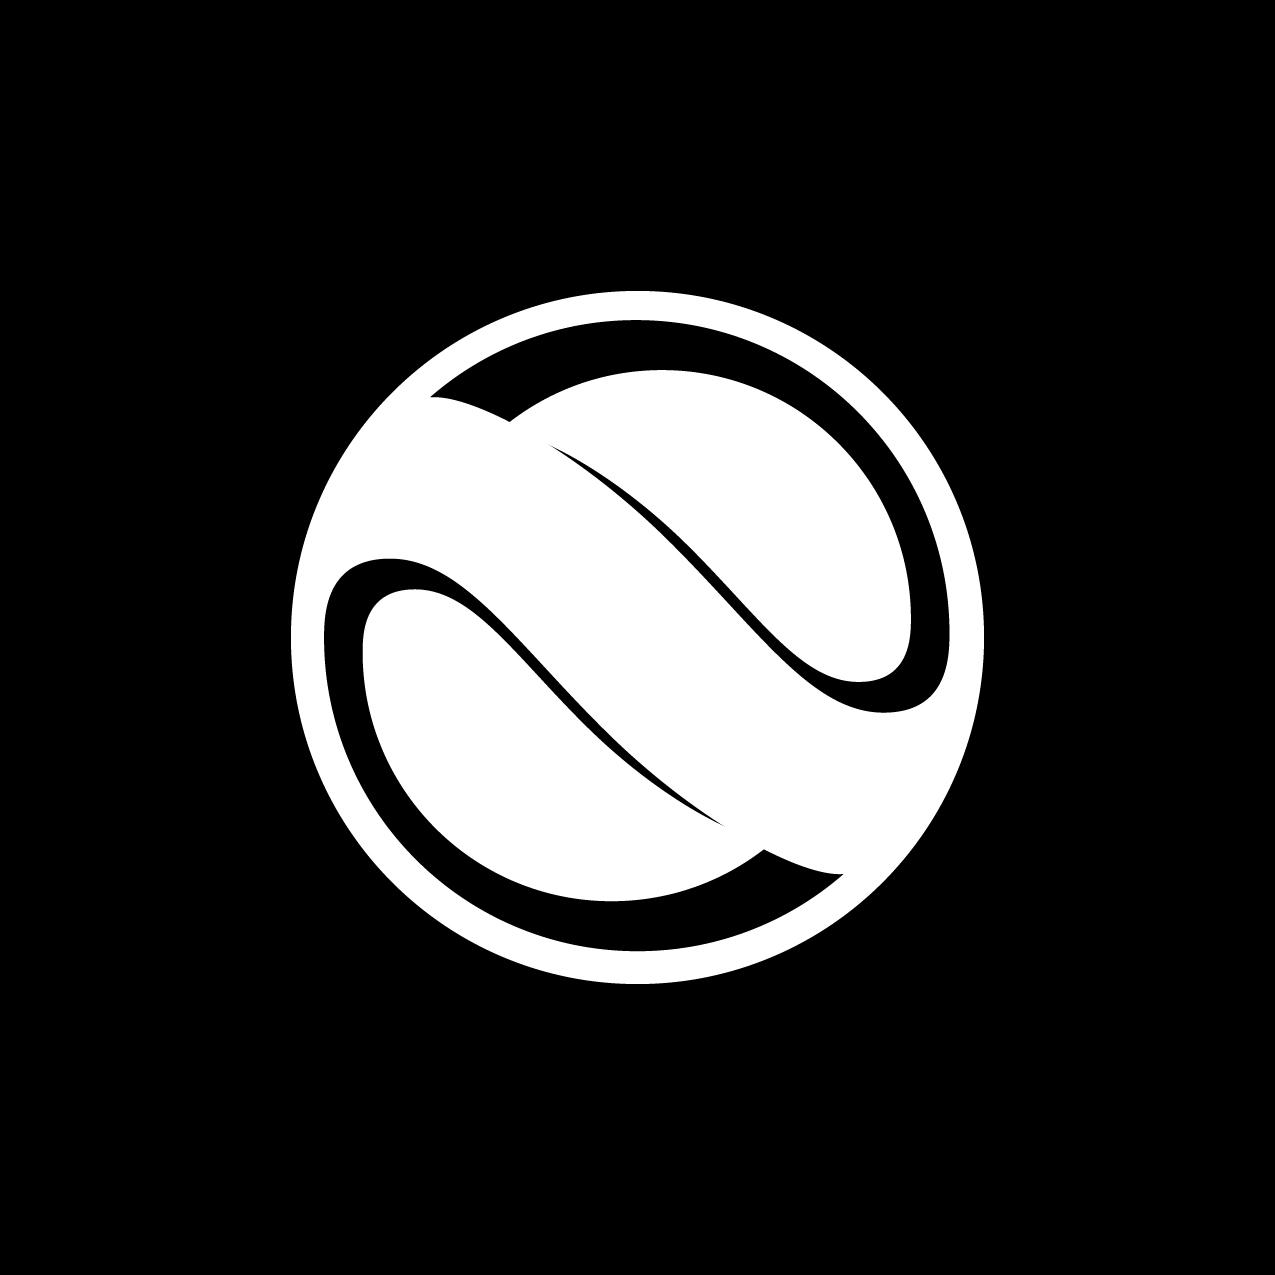 Letter O1 Design by Furia